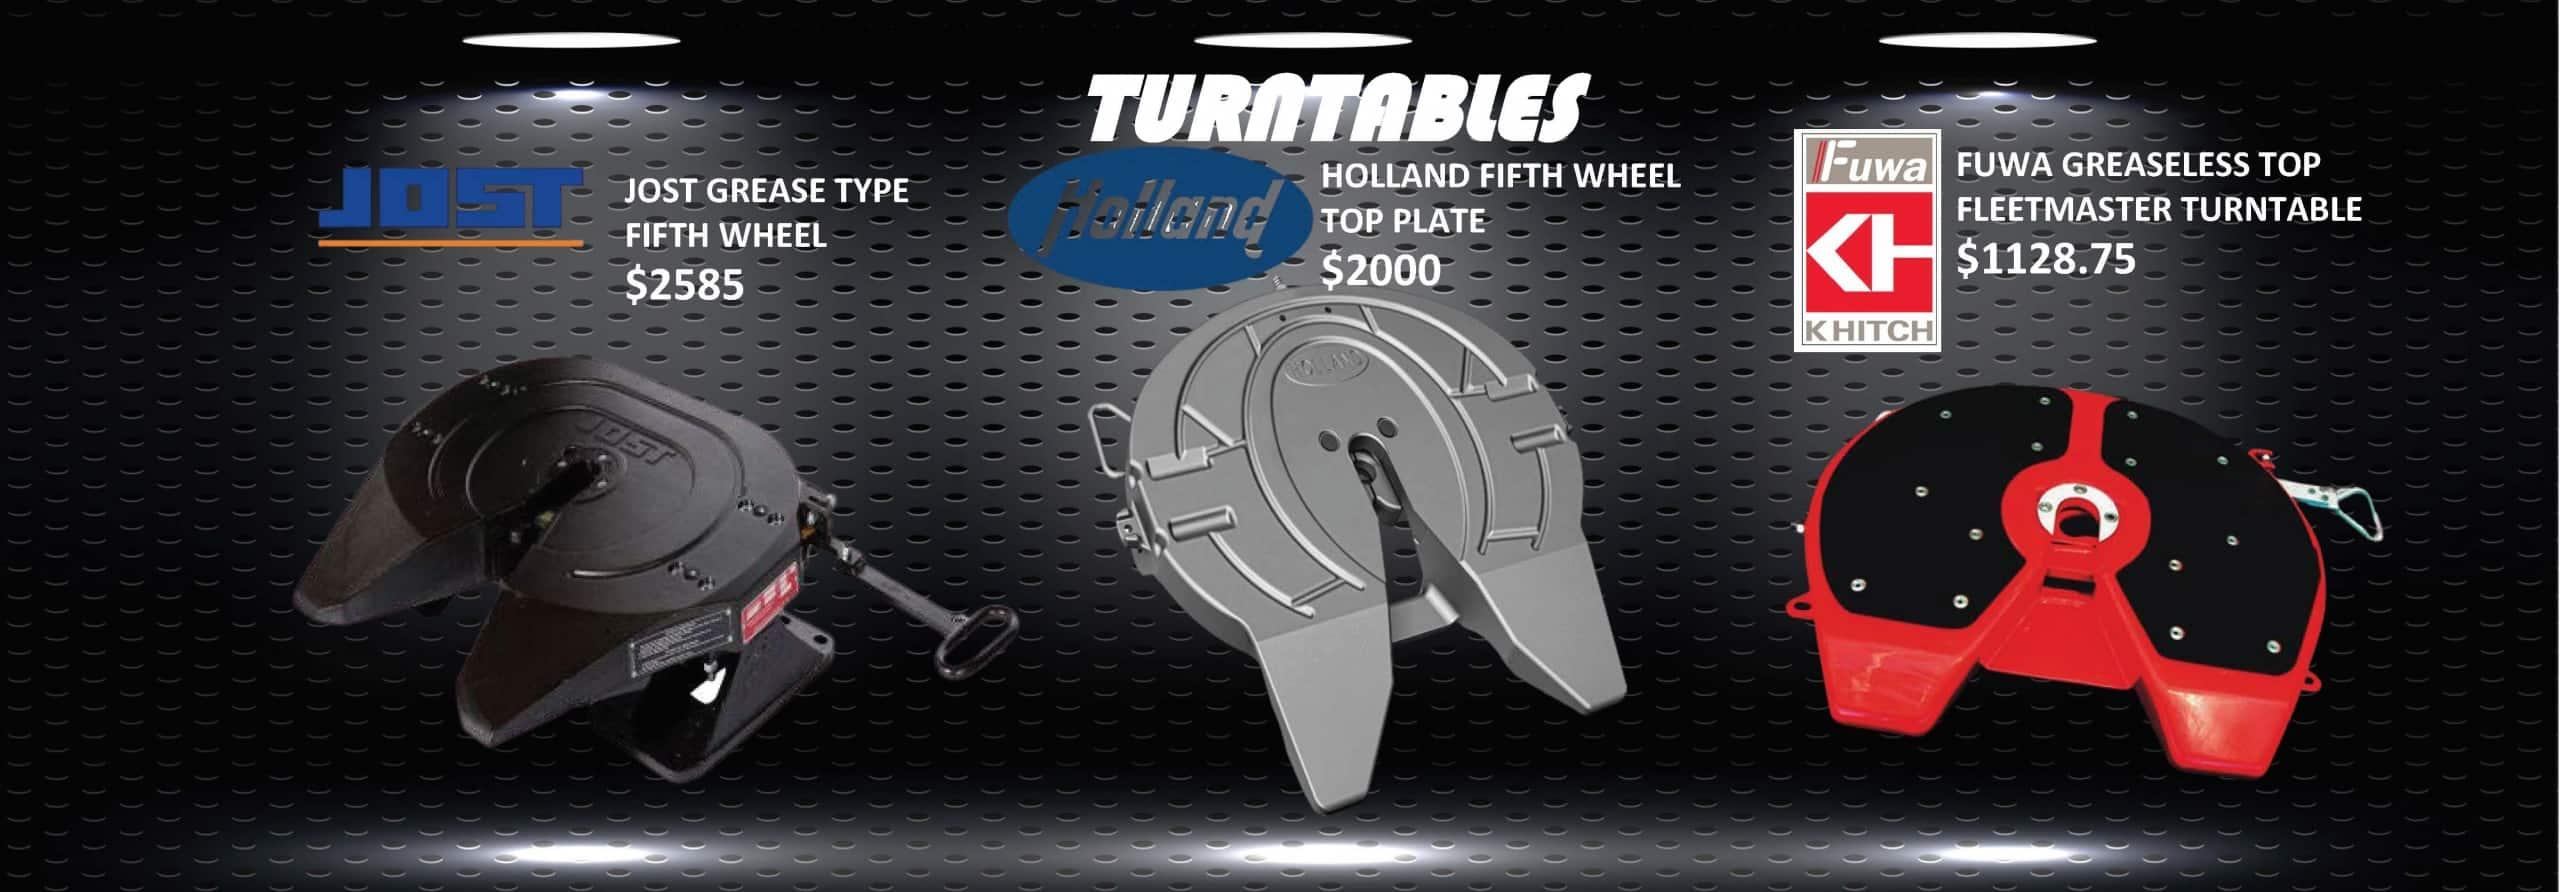 Turntables for semi trailer